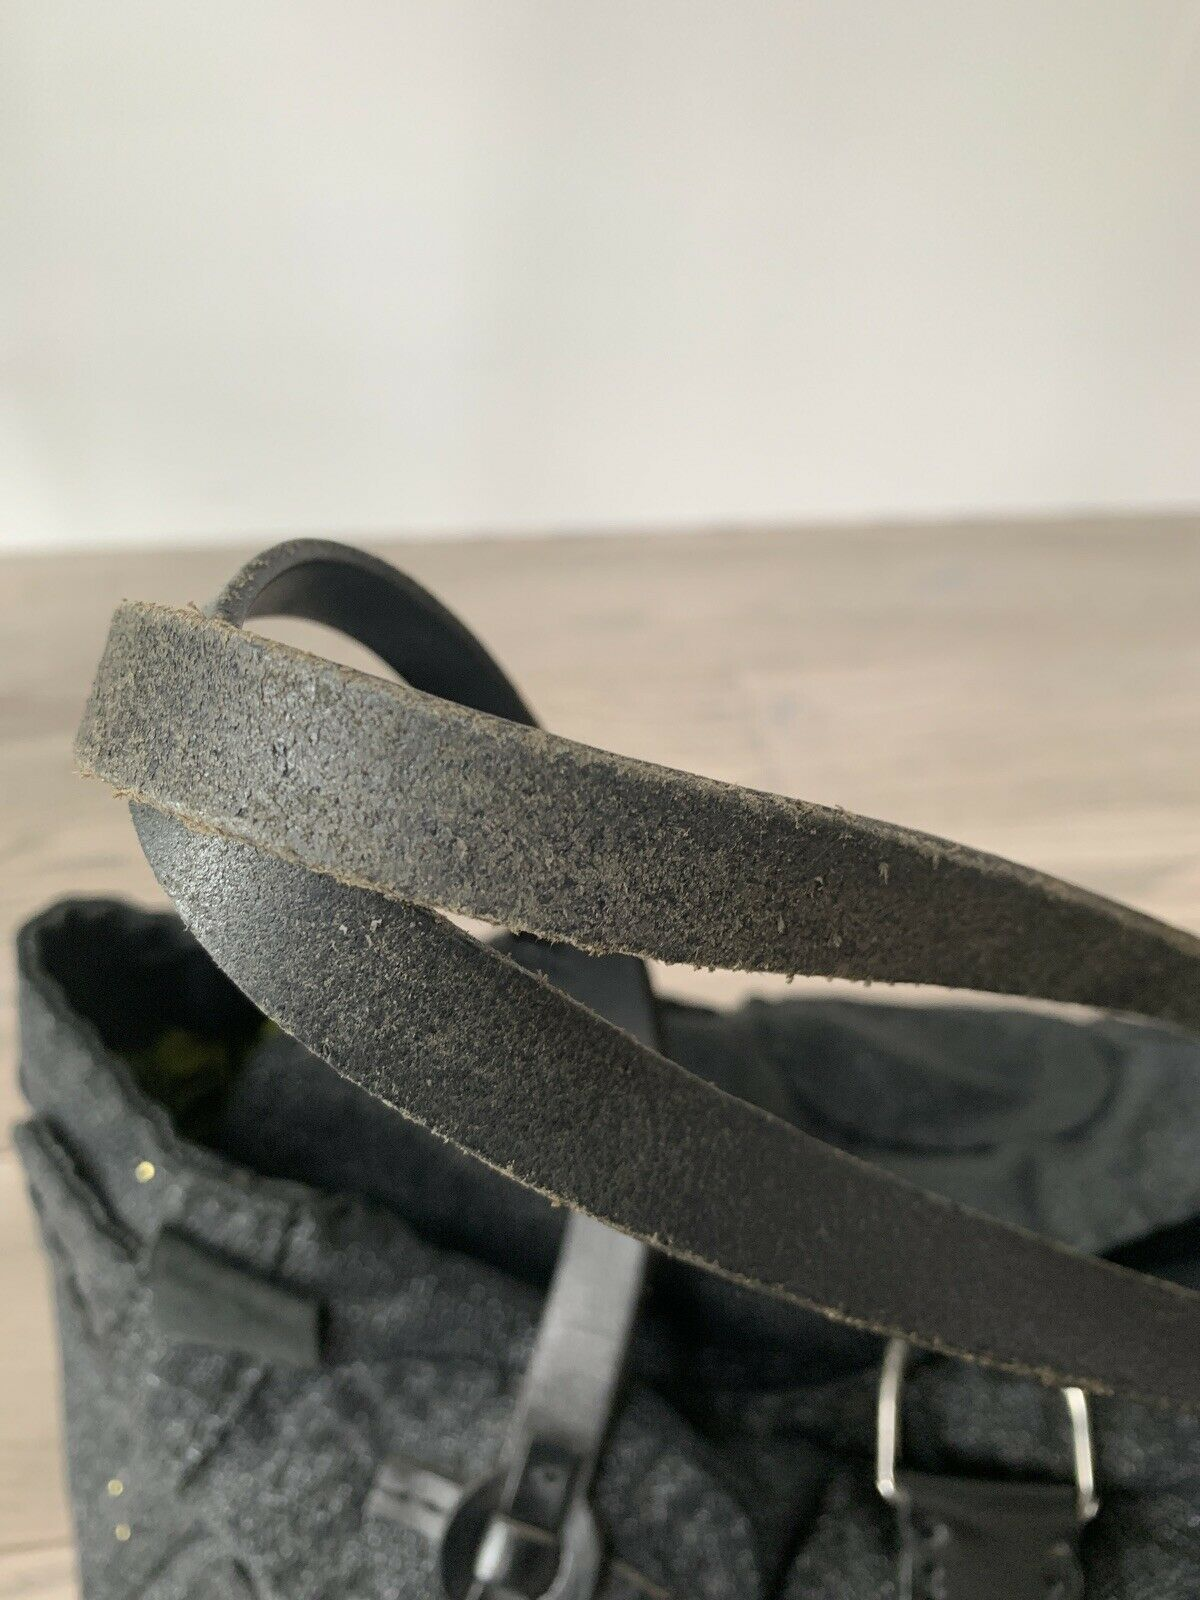 jamin puech handbags - image 4